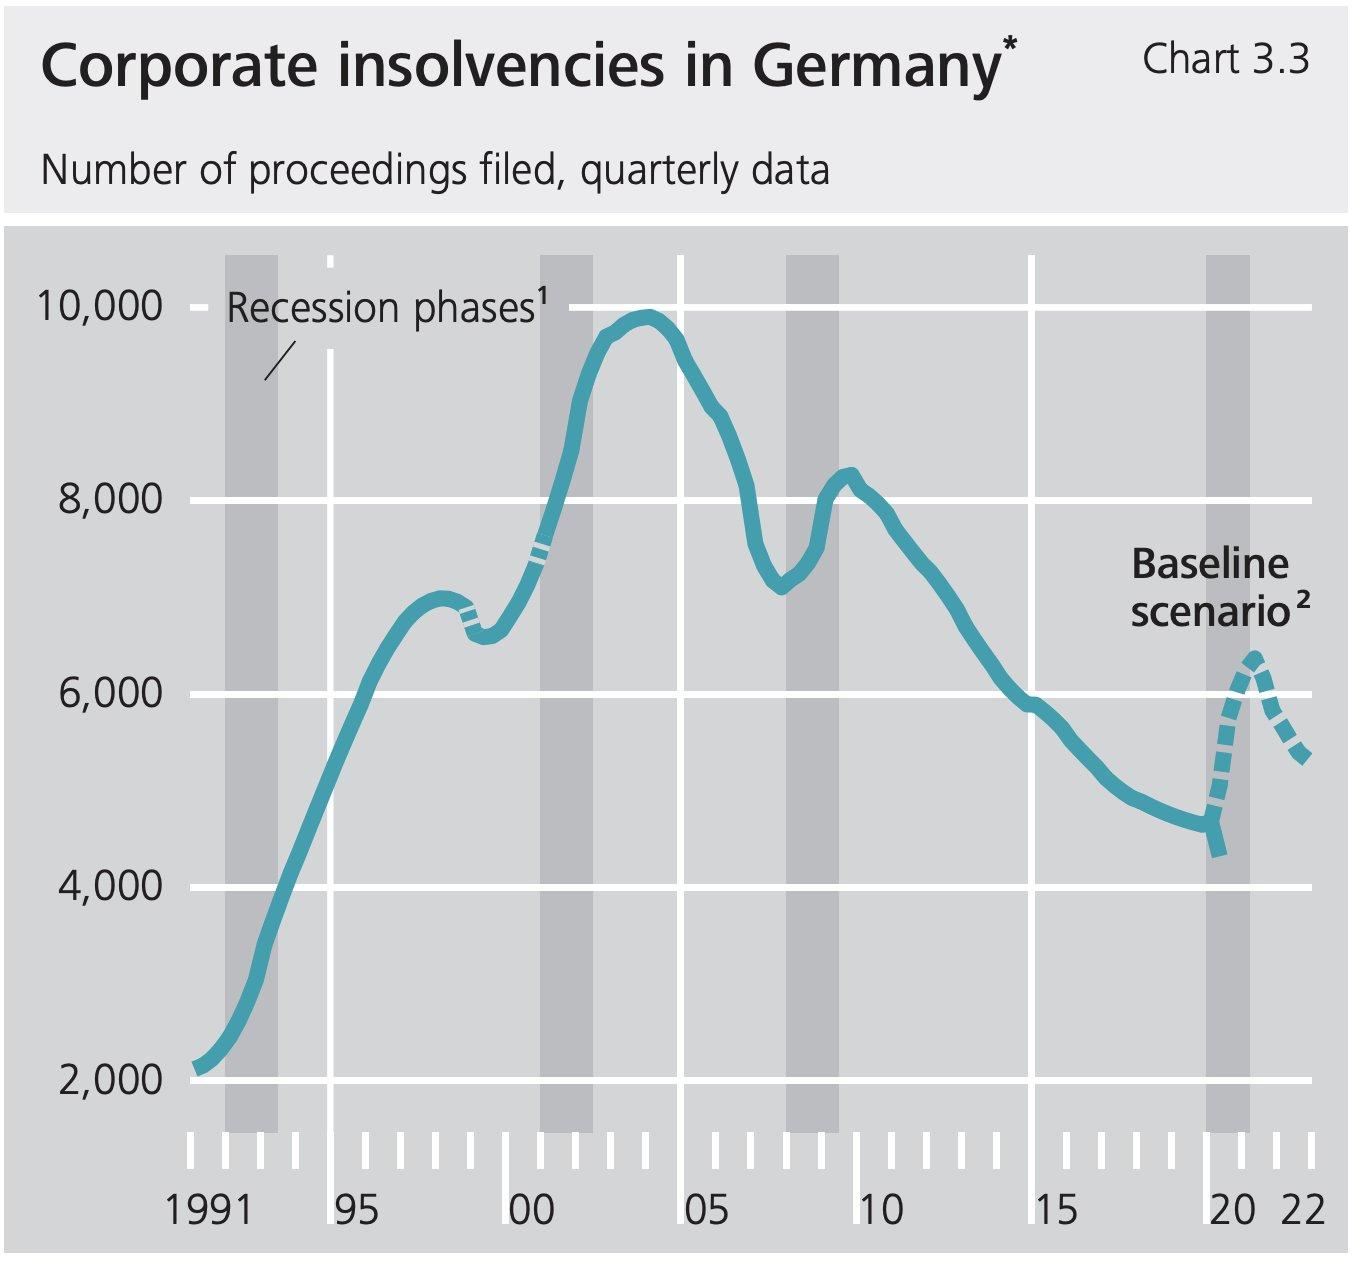 Expected corporate Insolvencies in Germany. Source deutsche Bundesbank as of October 14th, 2020.